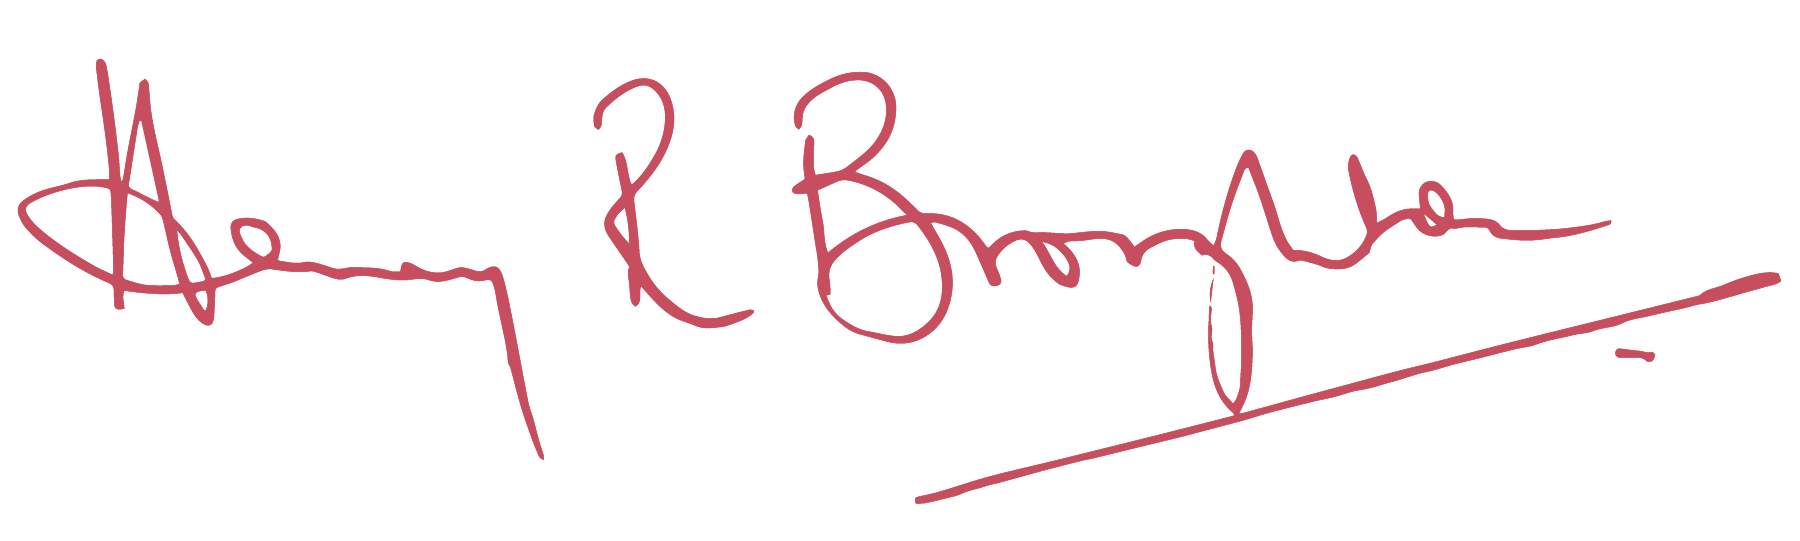 HRB-Signature